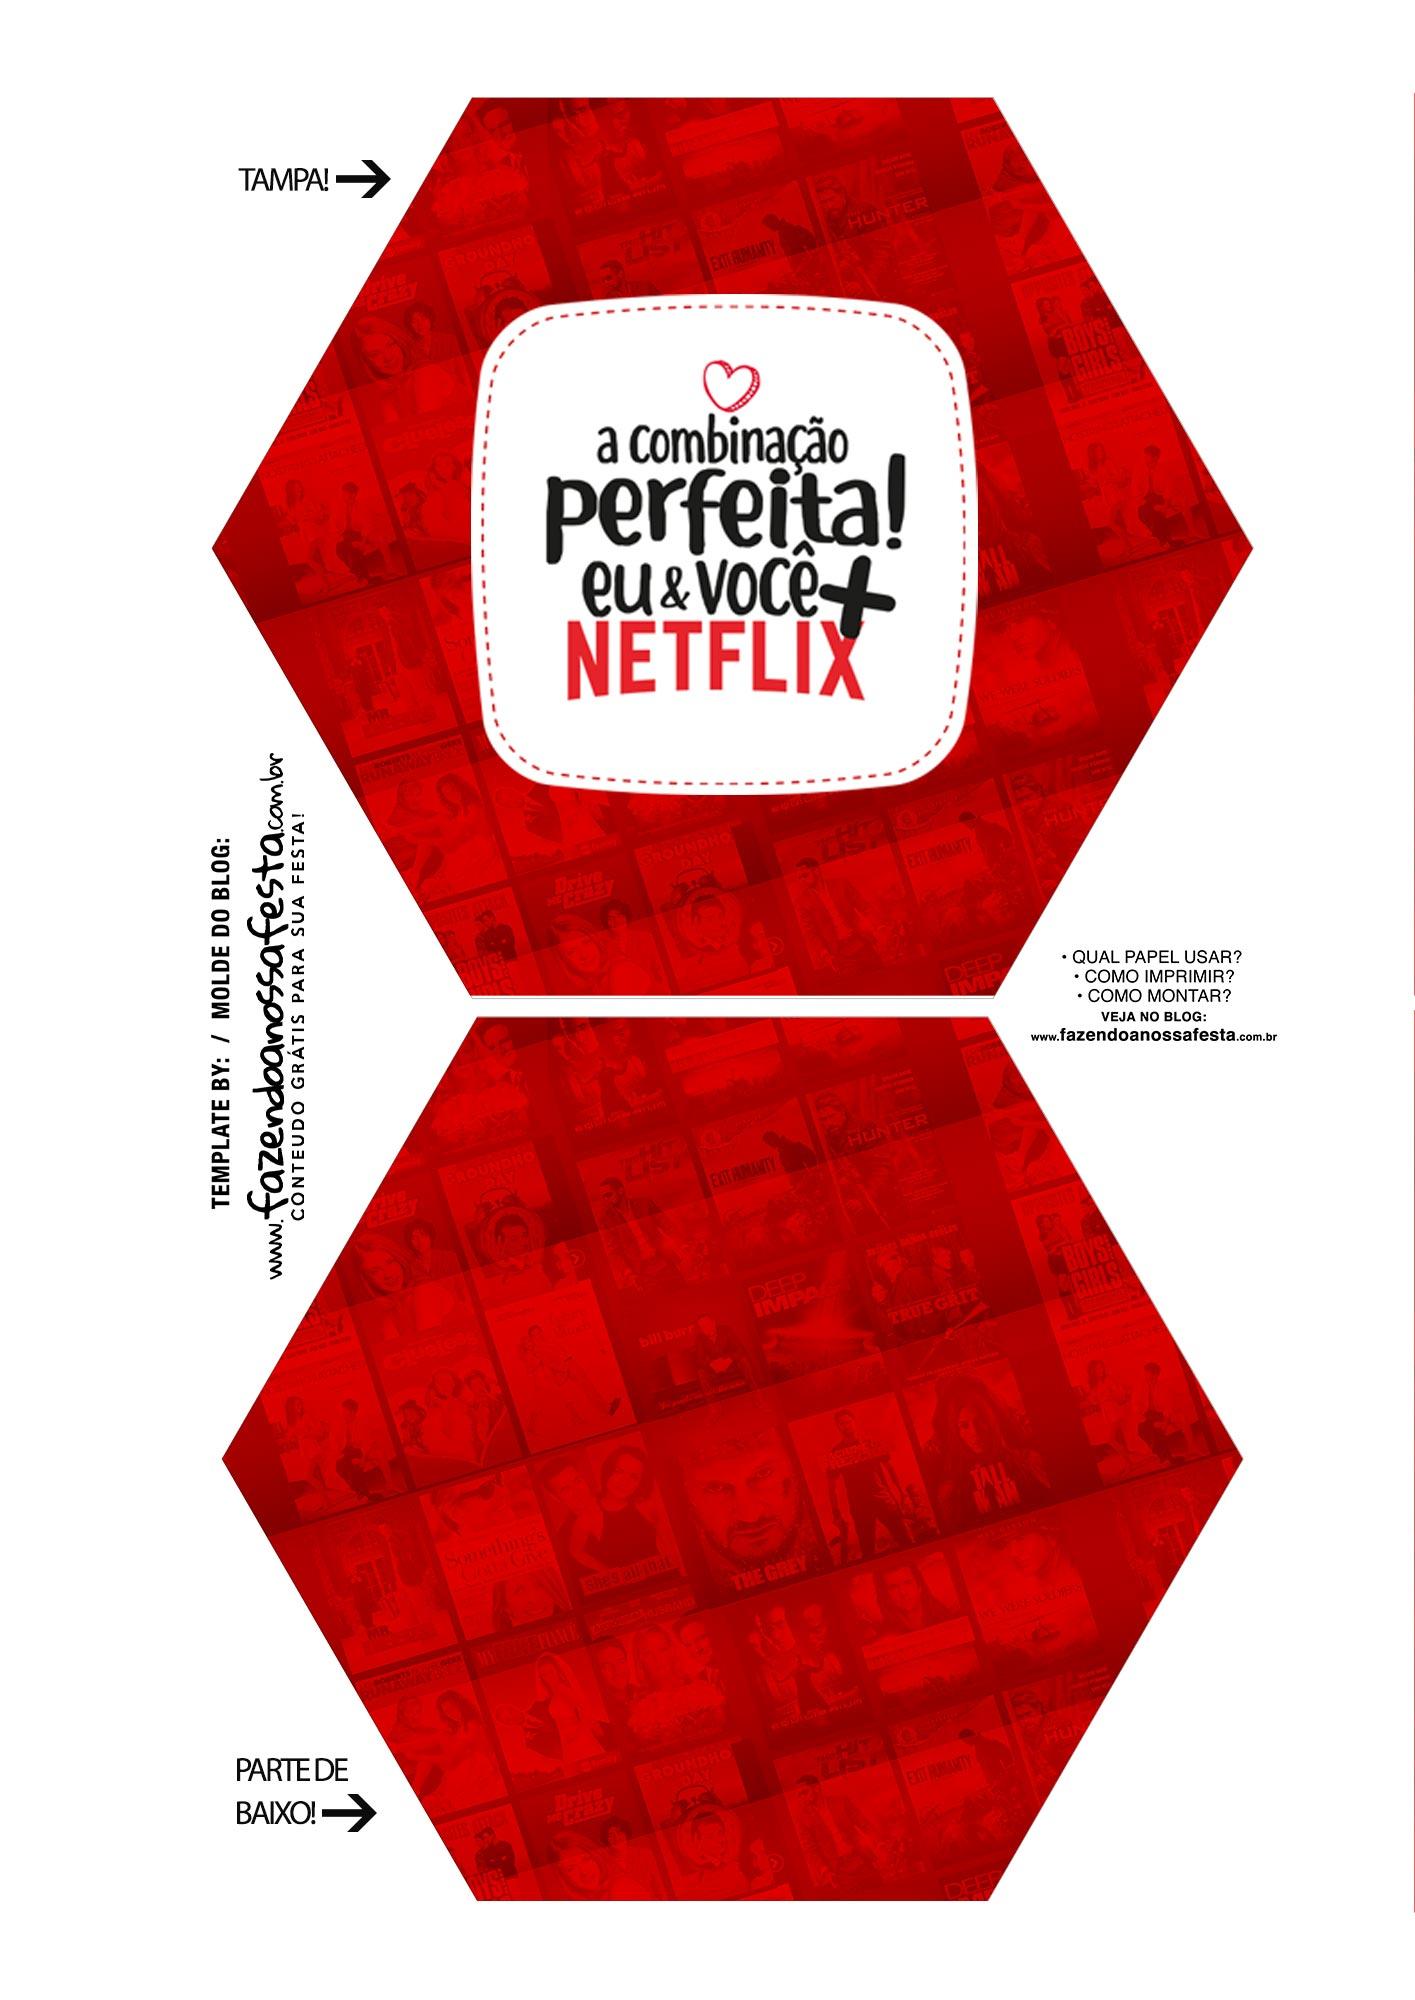 Caixa Explosiva Dia dos Namorados Netflix 1